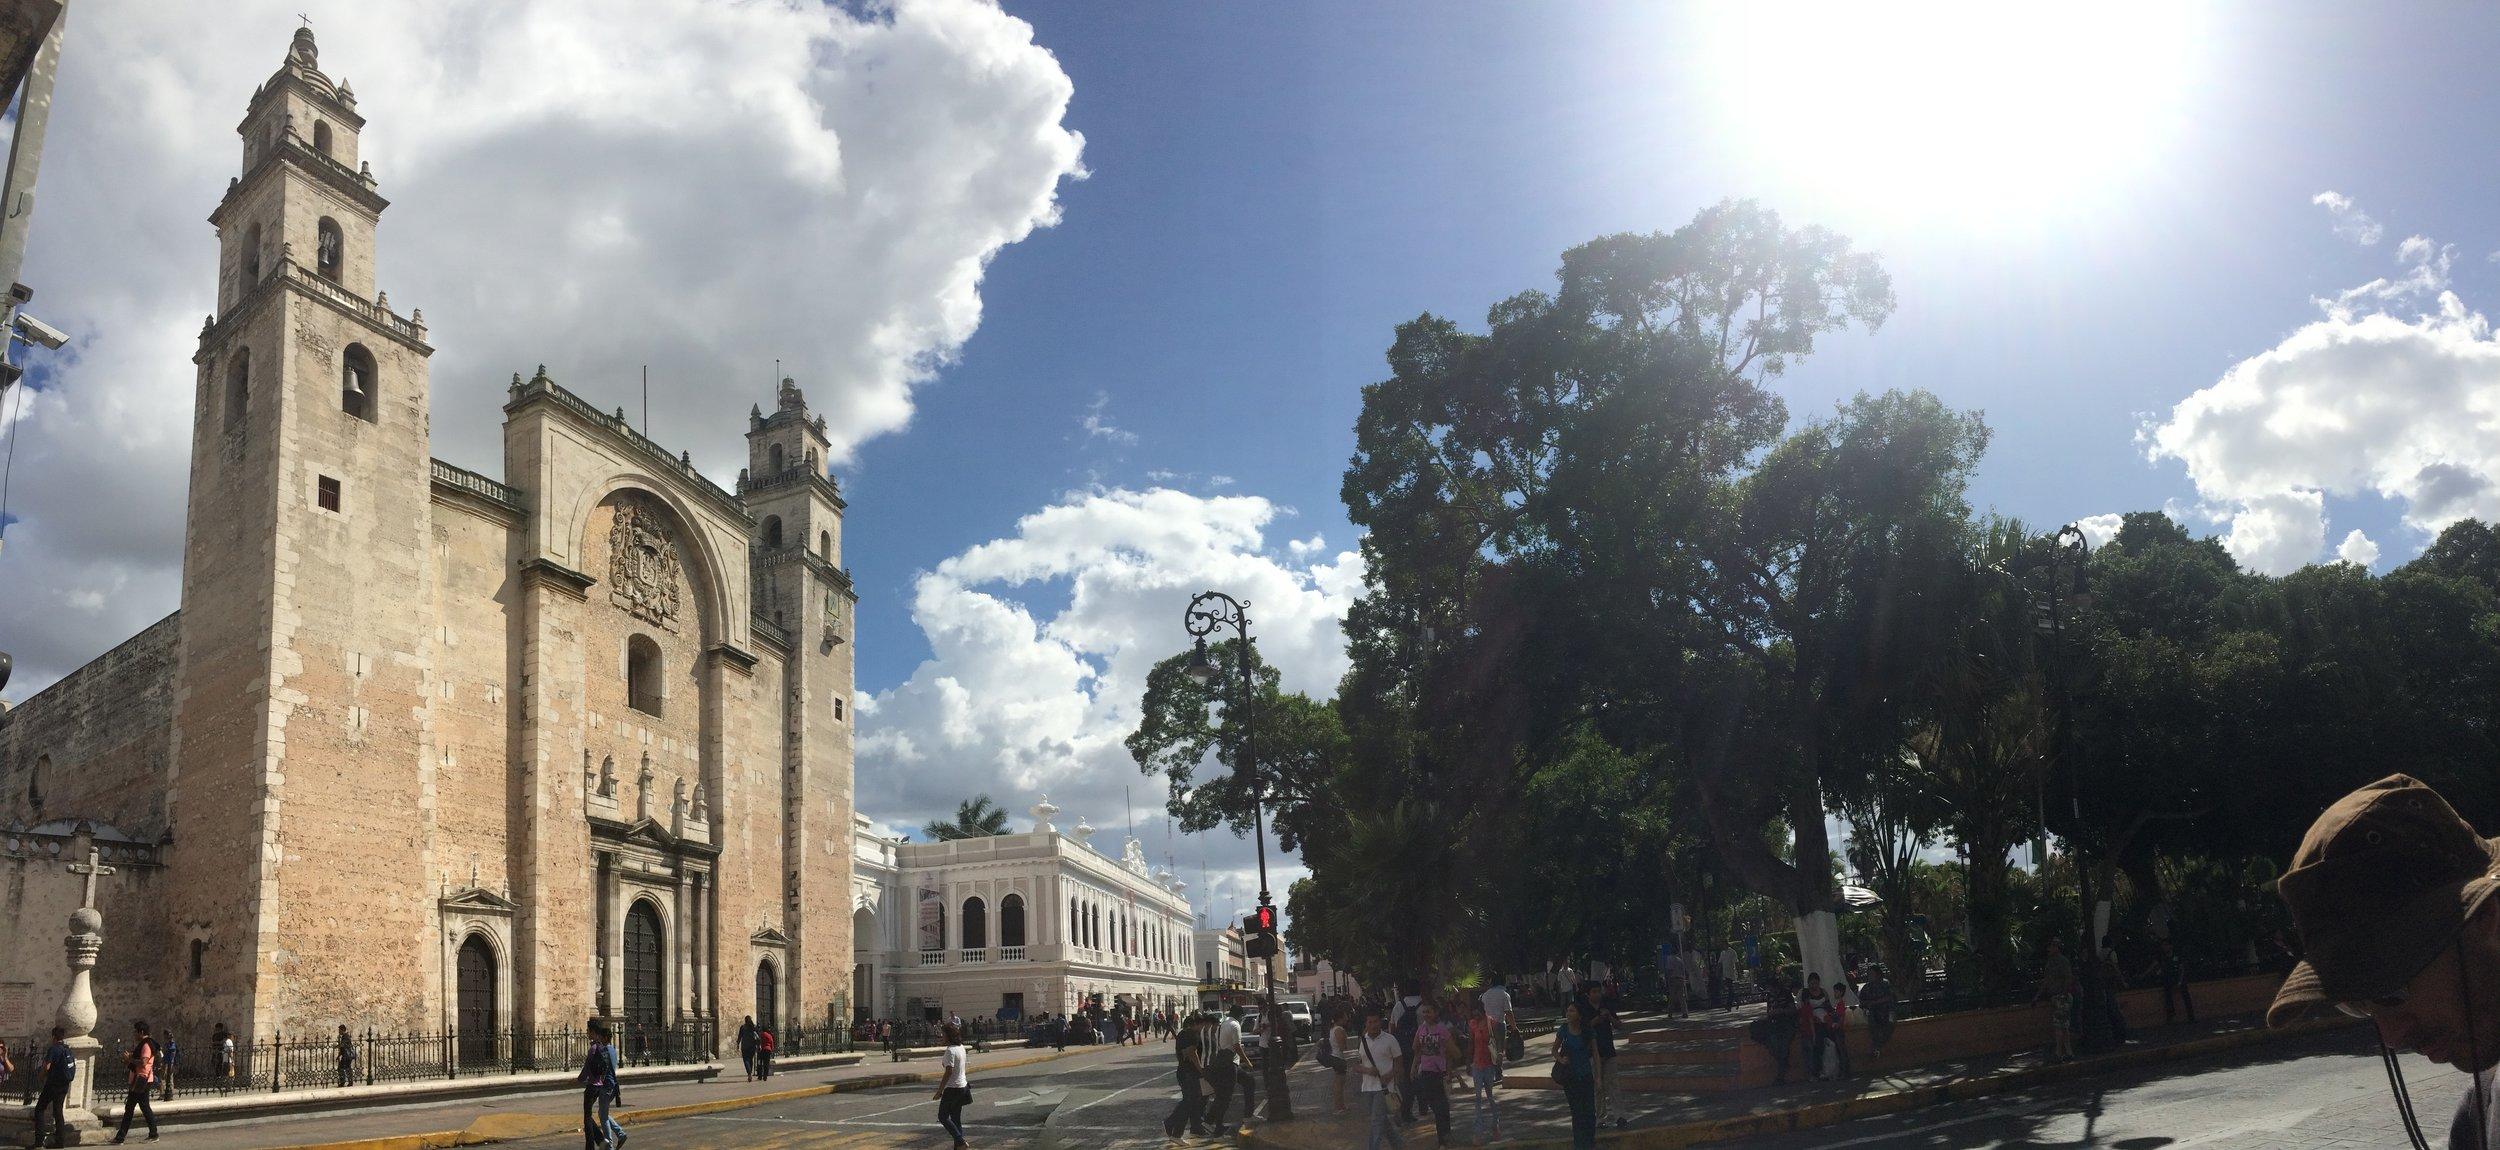 El centro de Mérida <3